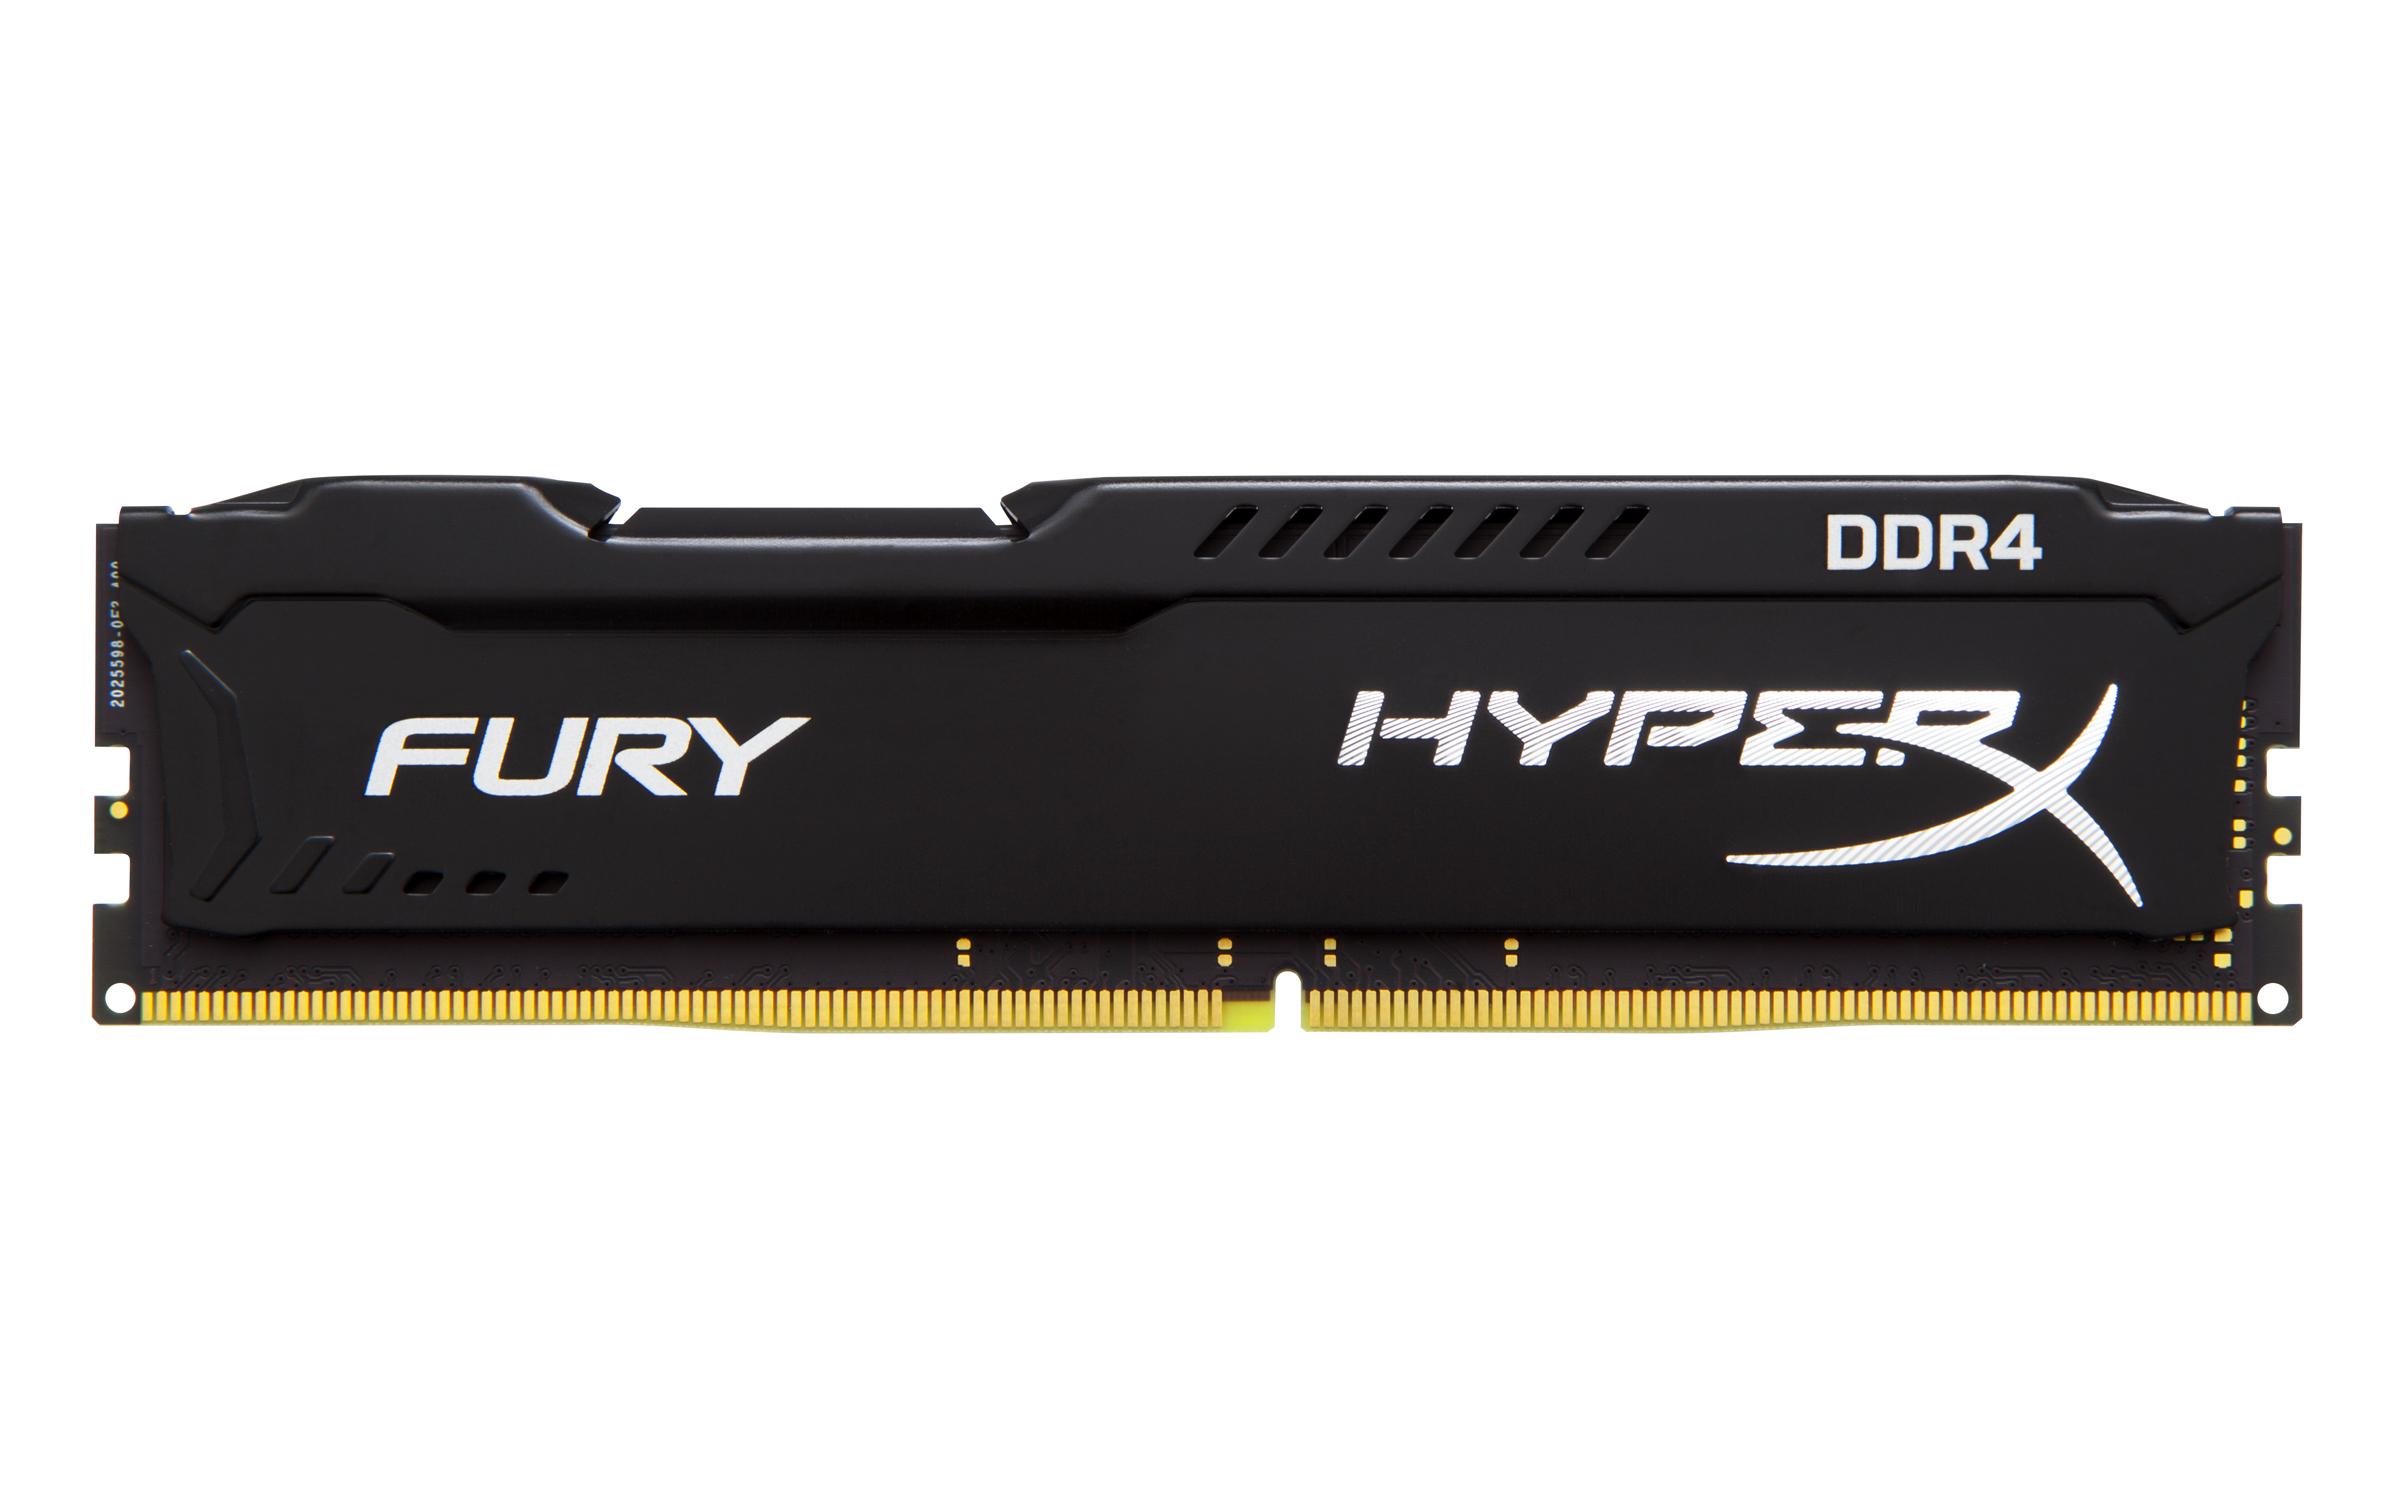 KINGSTON 8GB 2133MHz DDR4 CL14 DIMM HyperX FURY Black